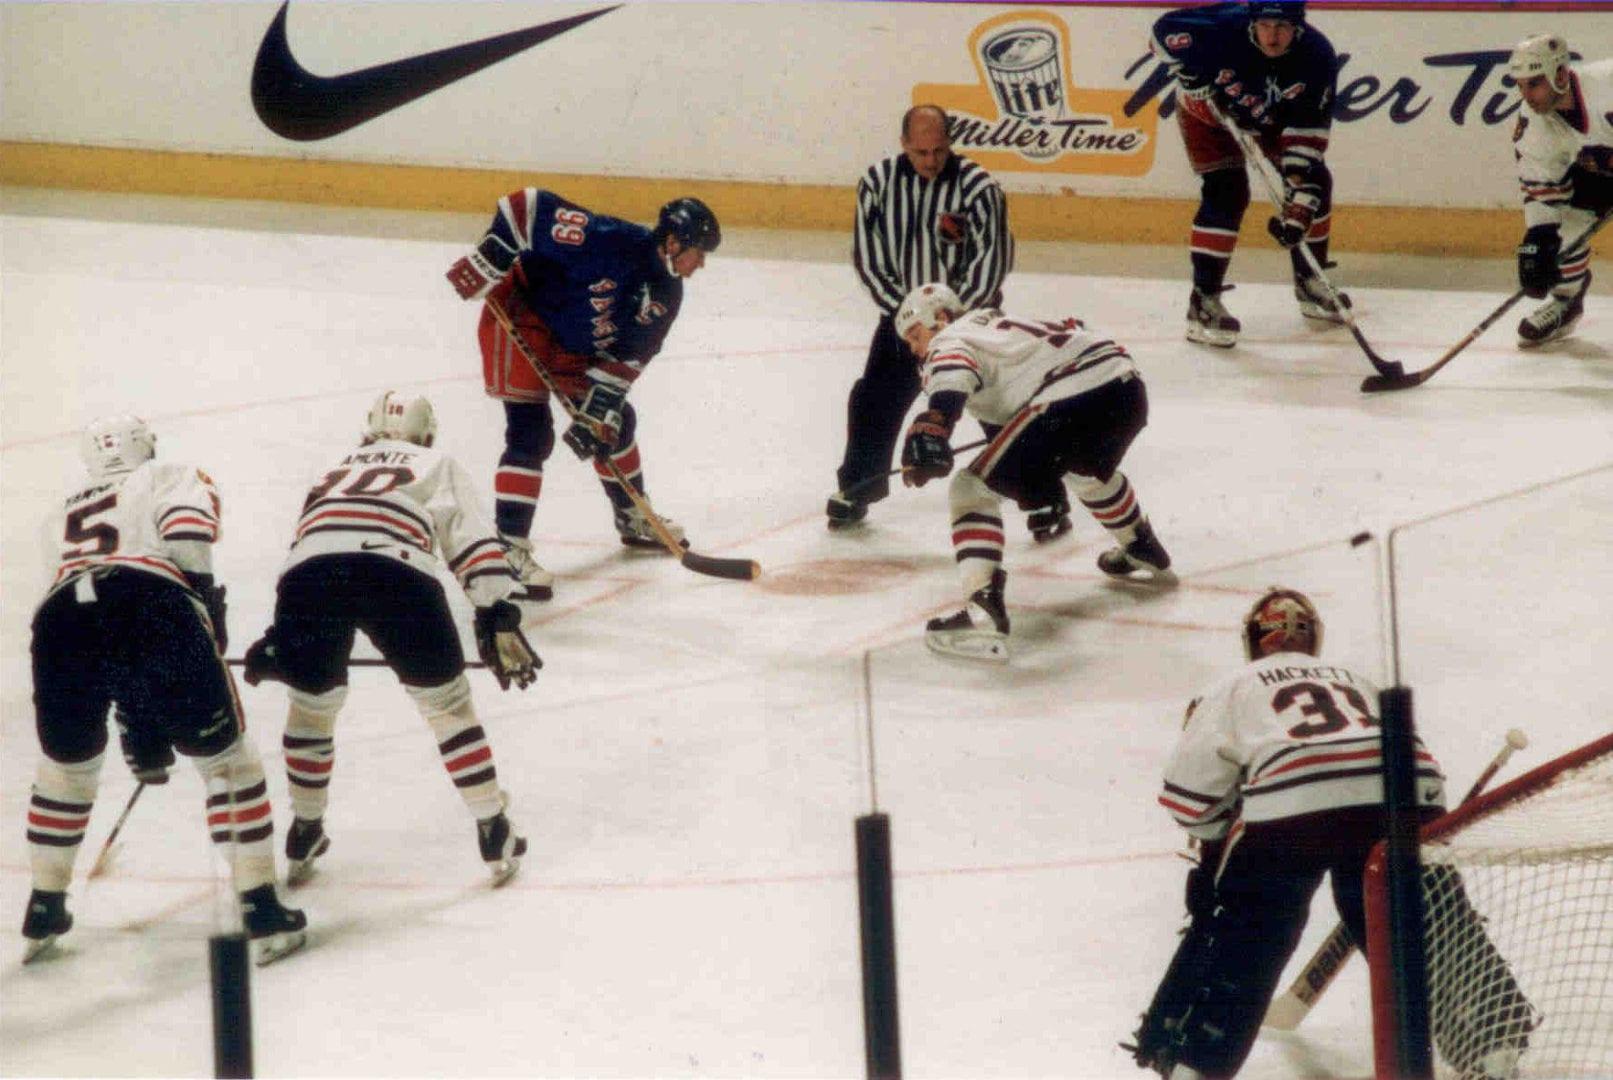 Ice hockey players match off